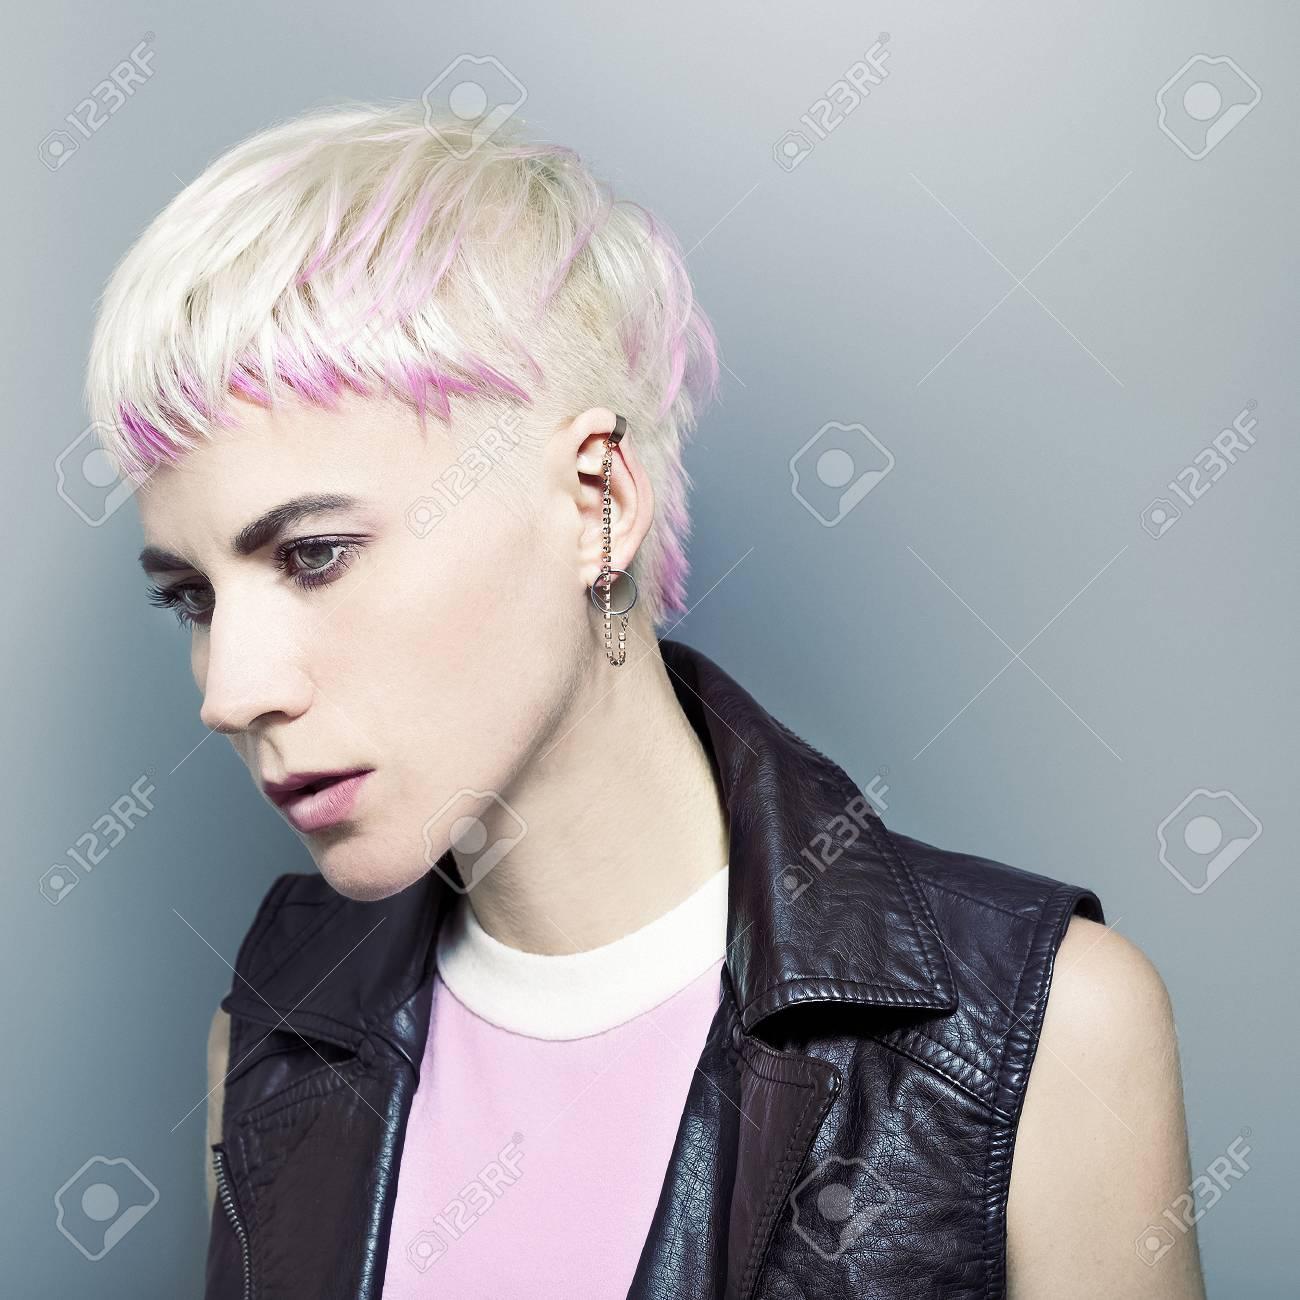 Stylish blonde with short hair. Rock fashion style